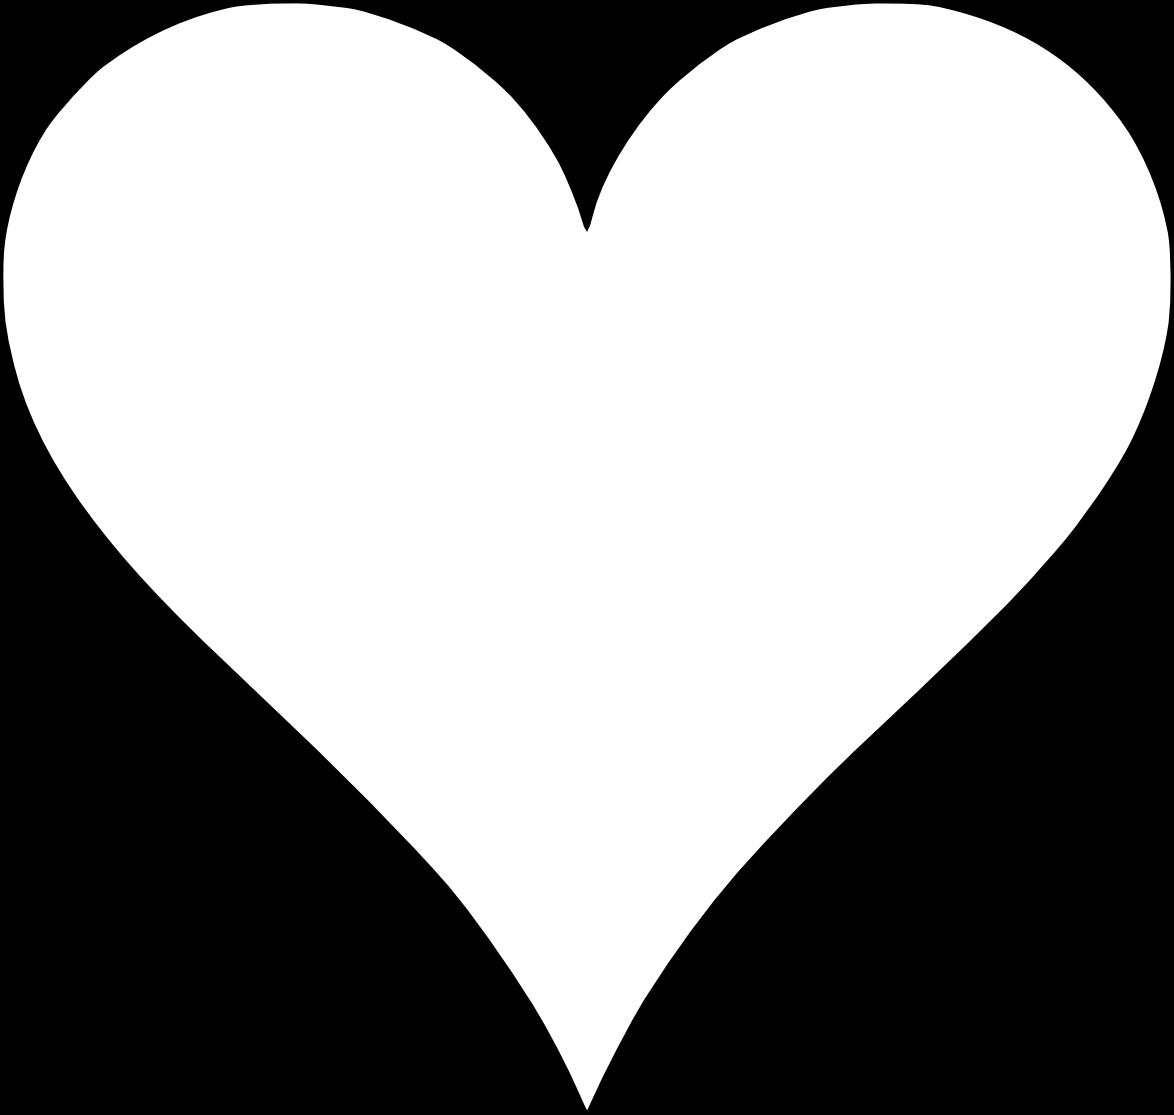 Printable Heart Template | 2017 Calendar